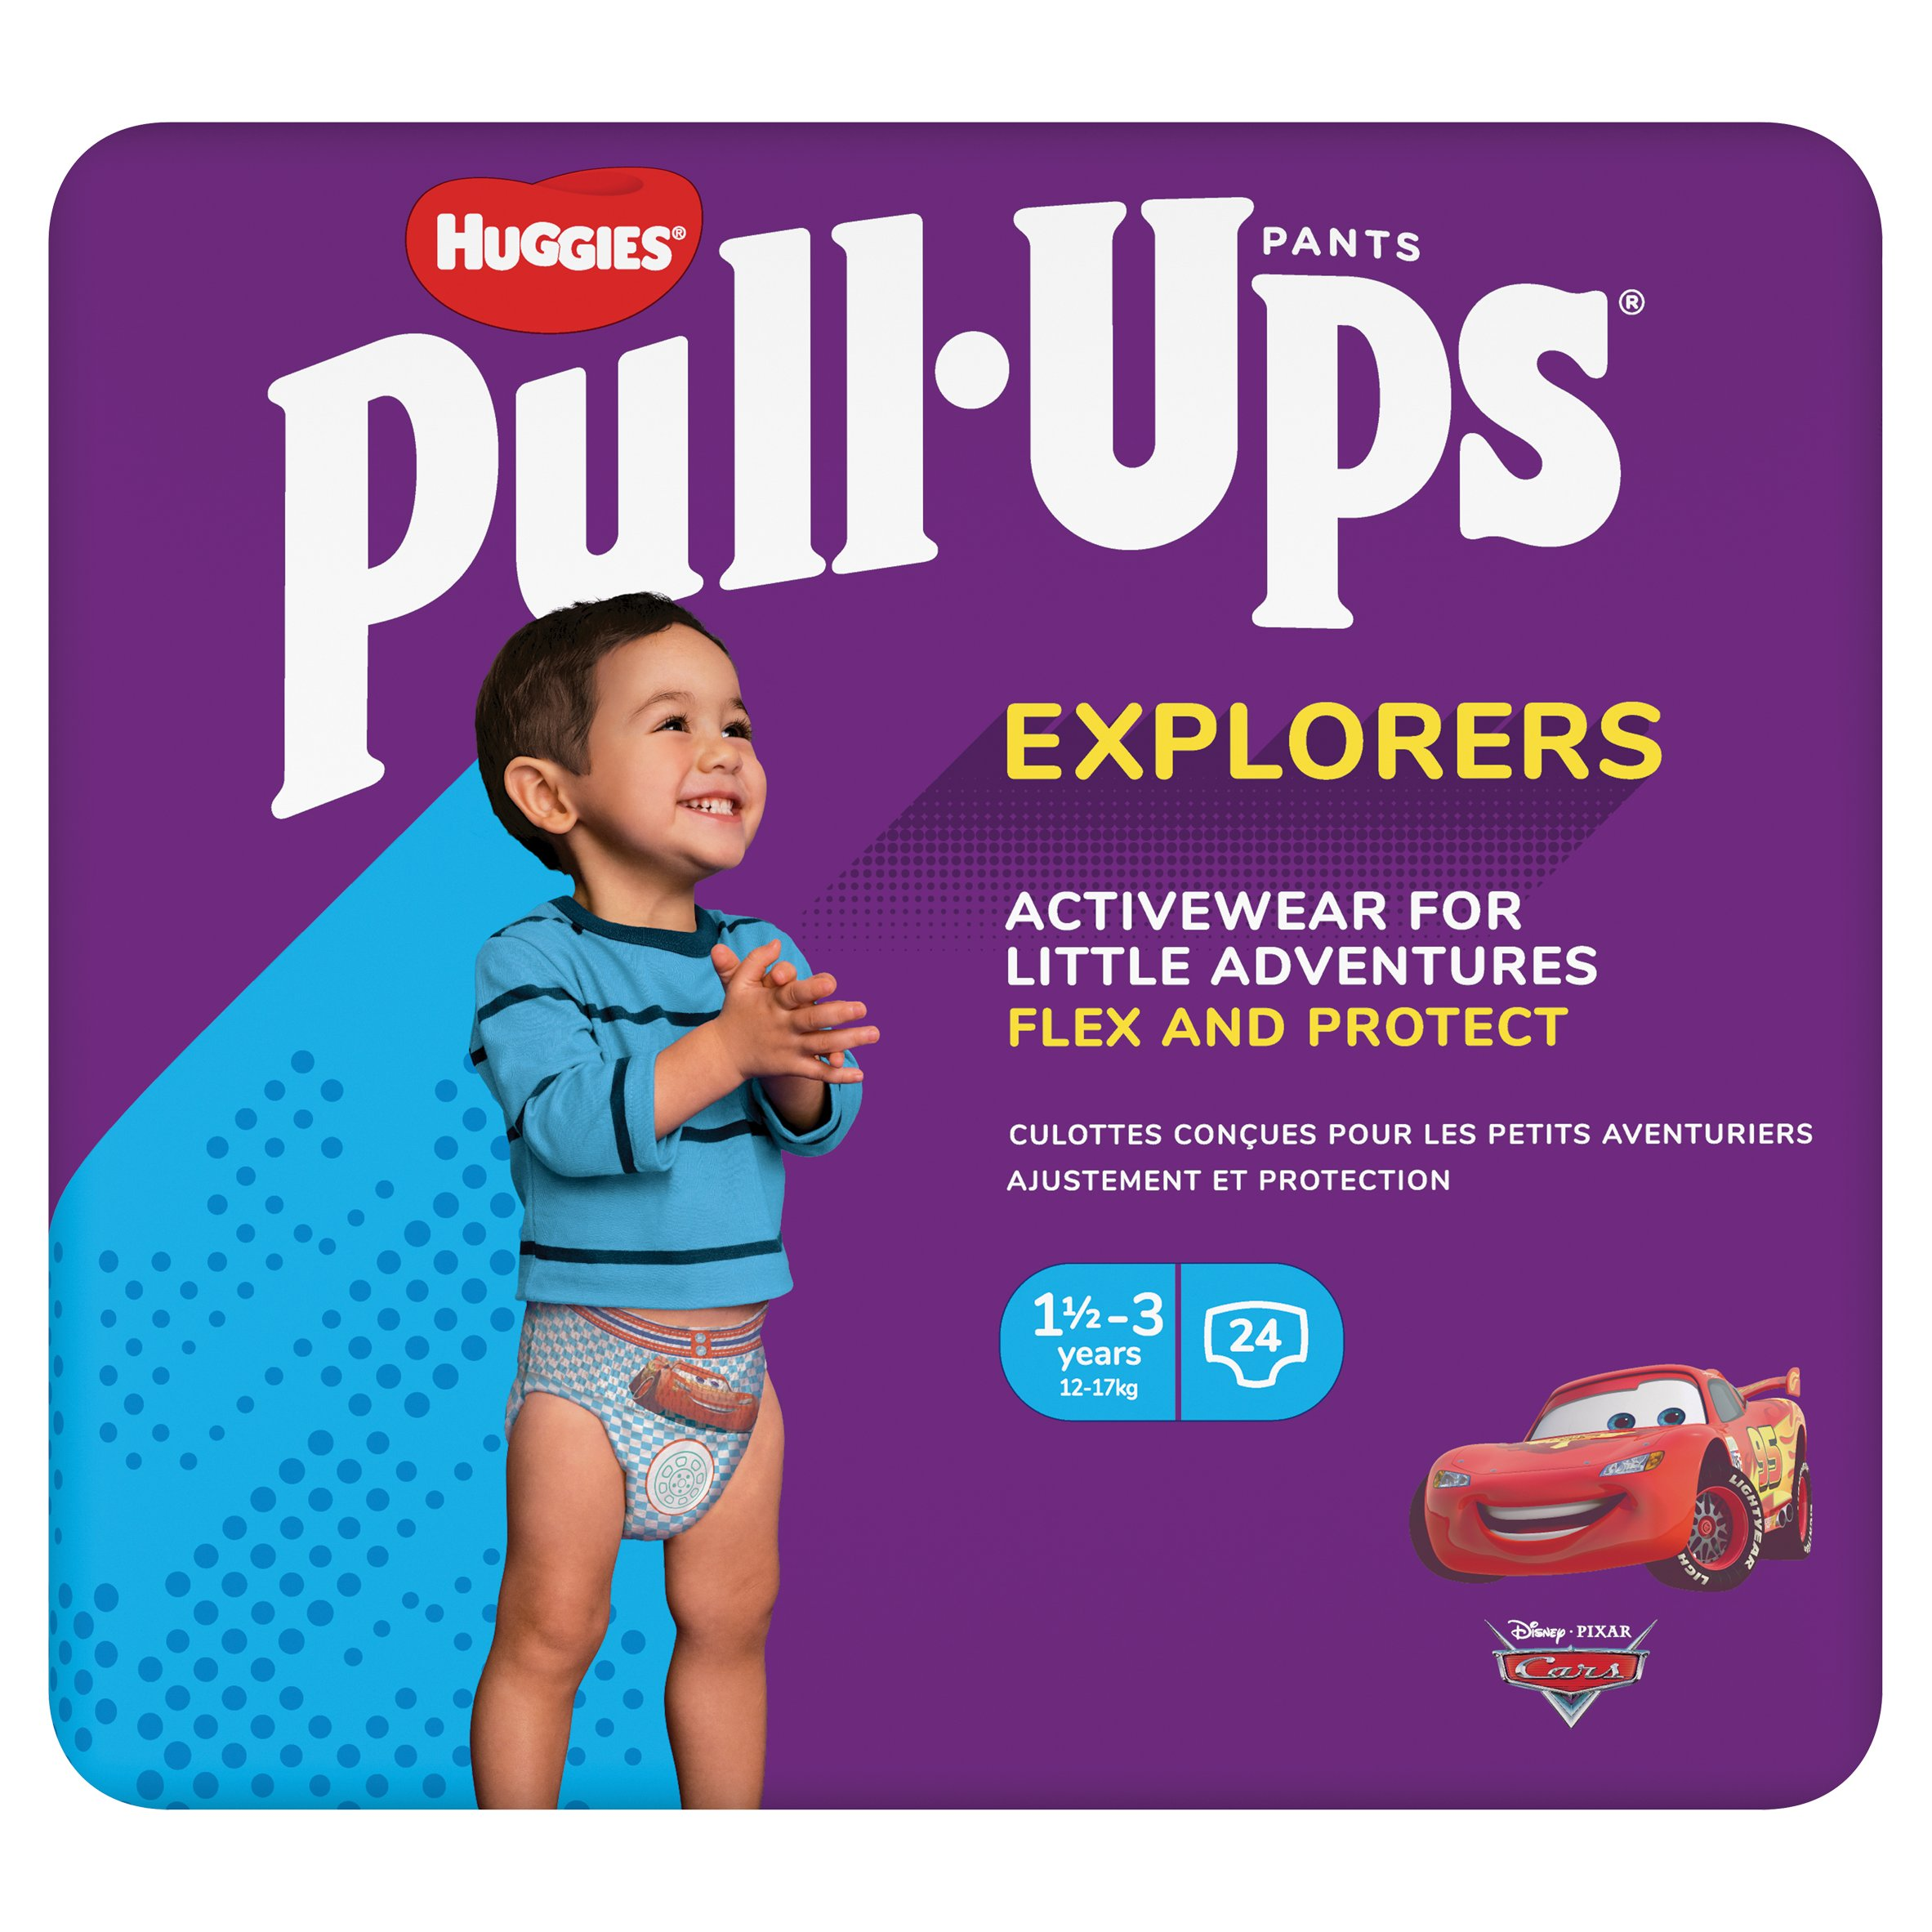 Huggies Pull-Ups Explorers 1.5-3 Years Blue 24 Pack